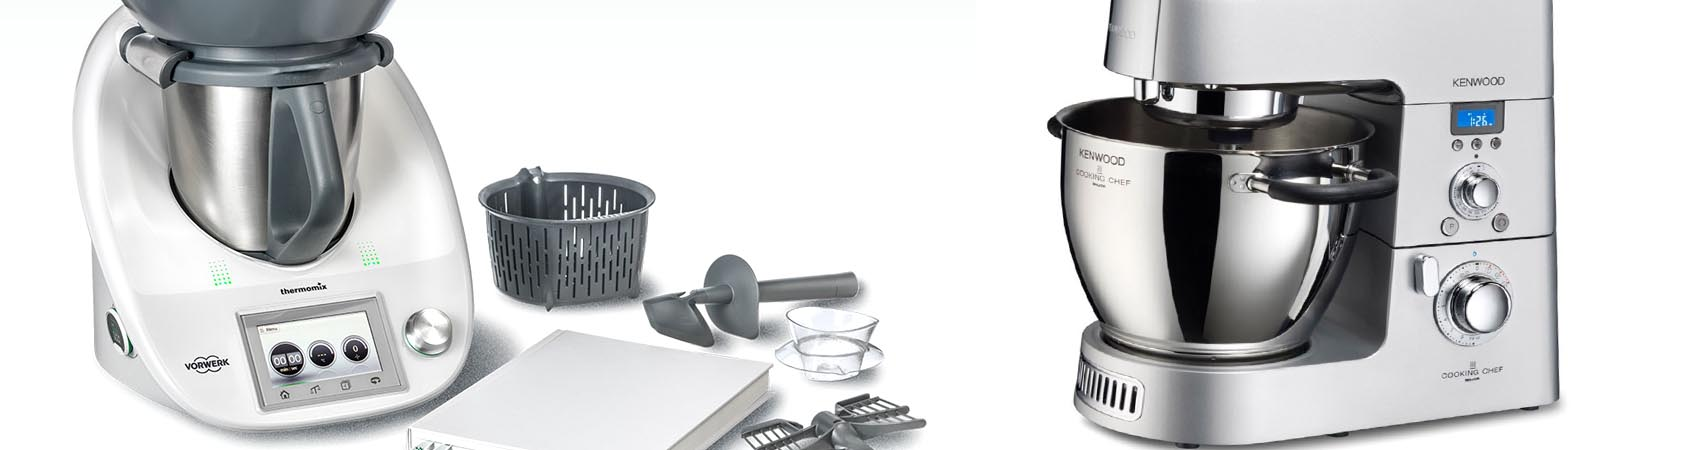 Cooking chef vs Bimby, chi vince la sfida tra i robot da cucina?